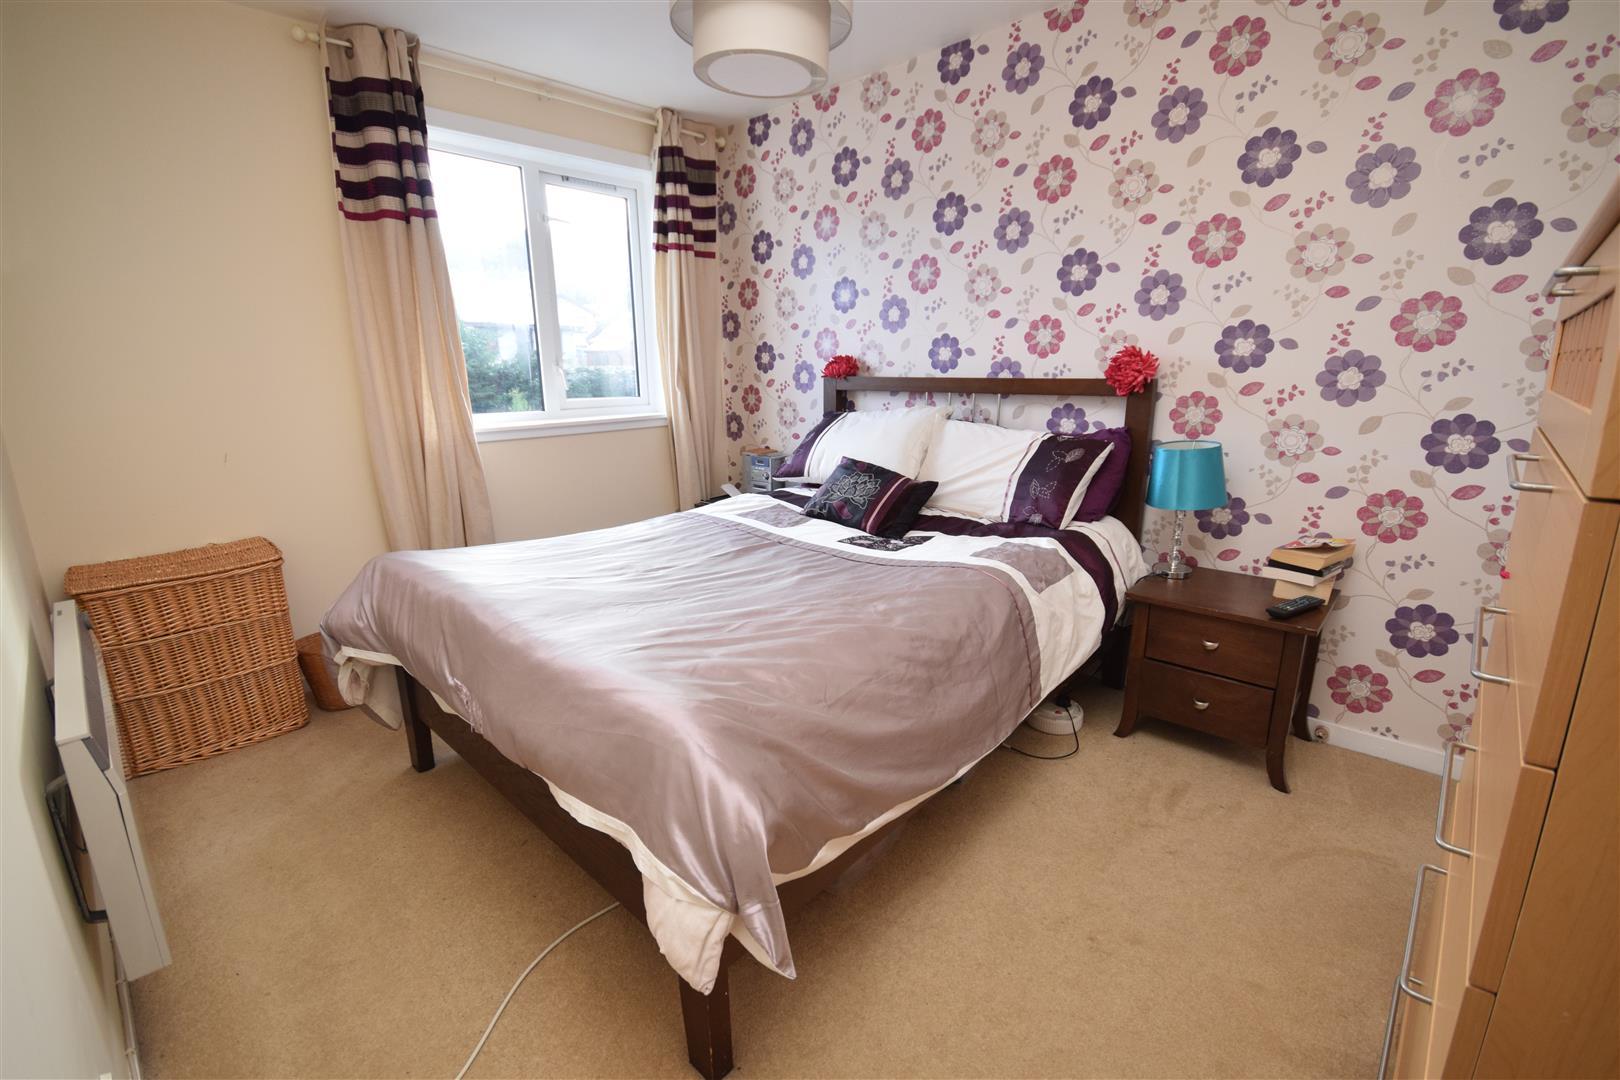 17, Appin Place, Aberfeldy, Perthshire, PH15 2AH, UK